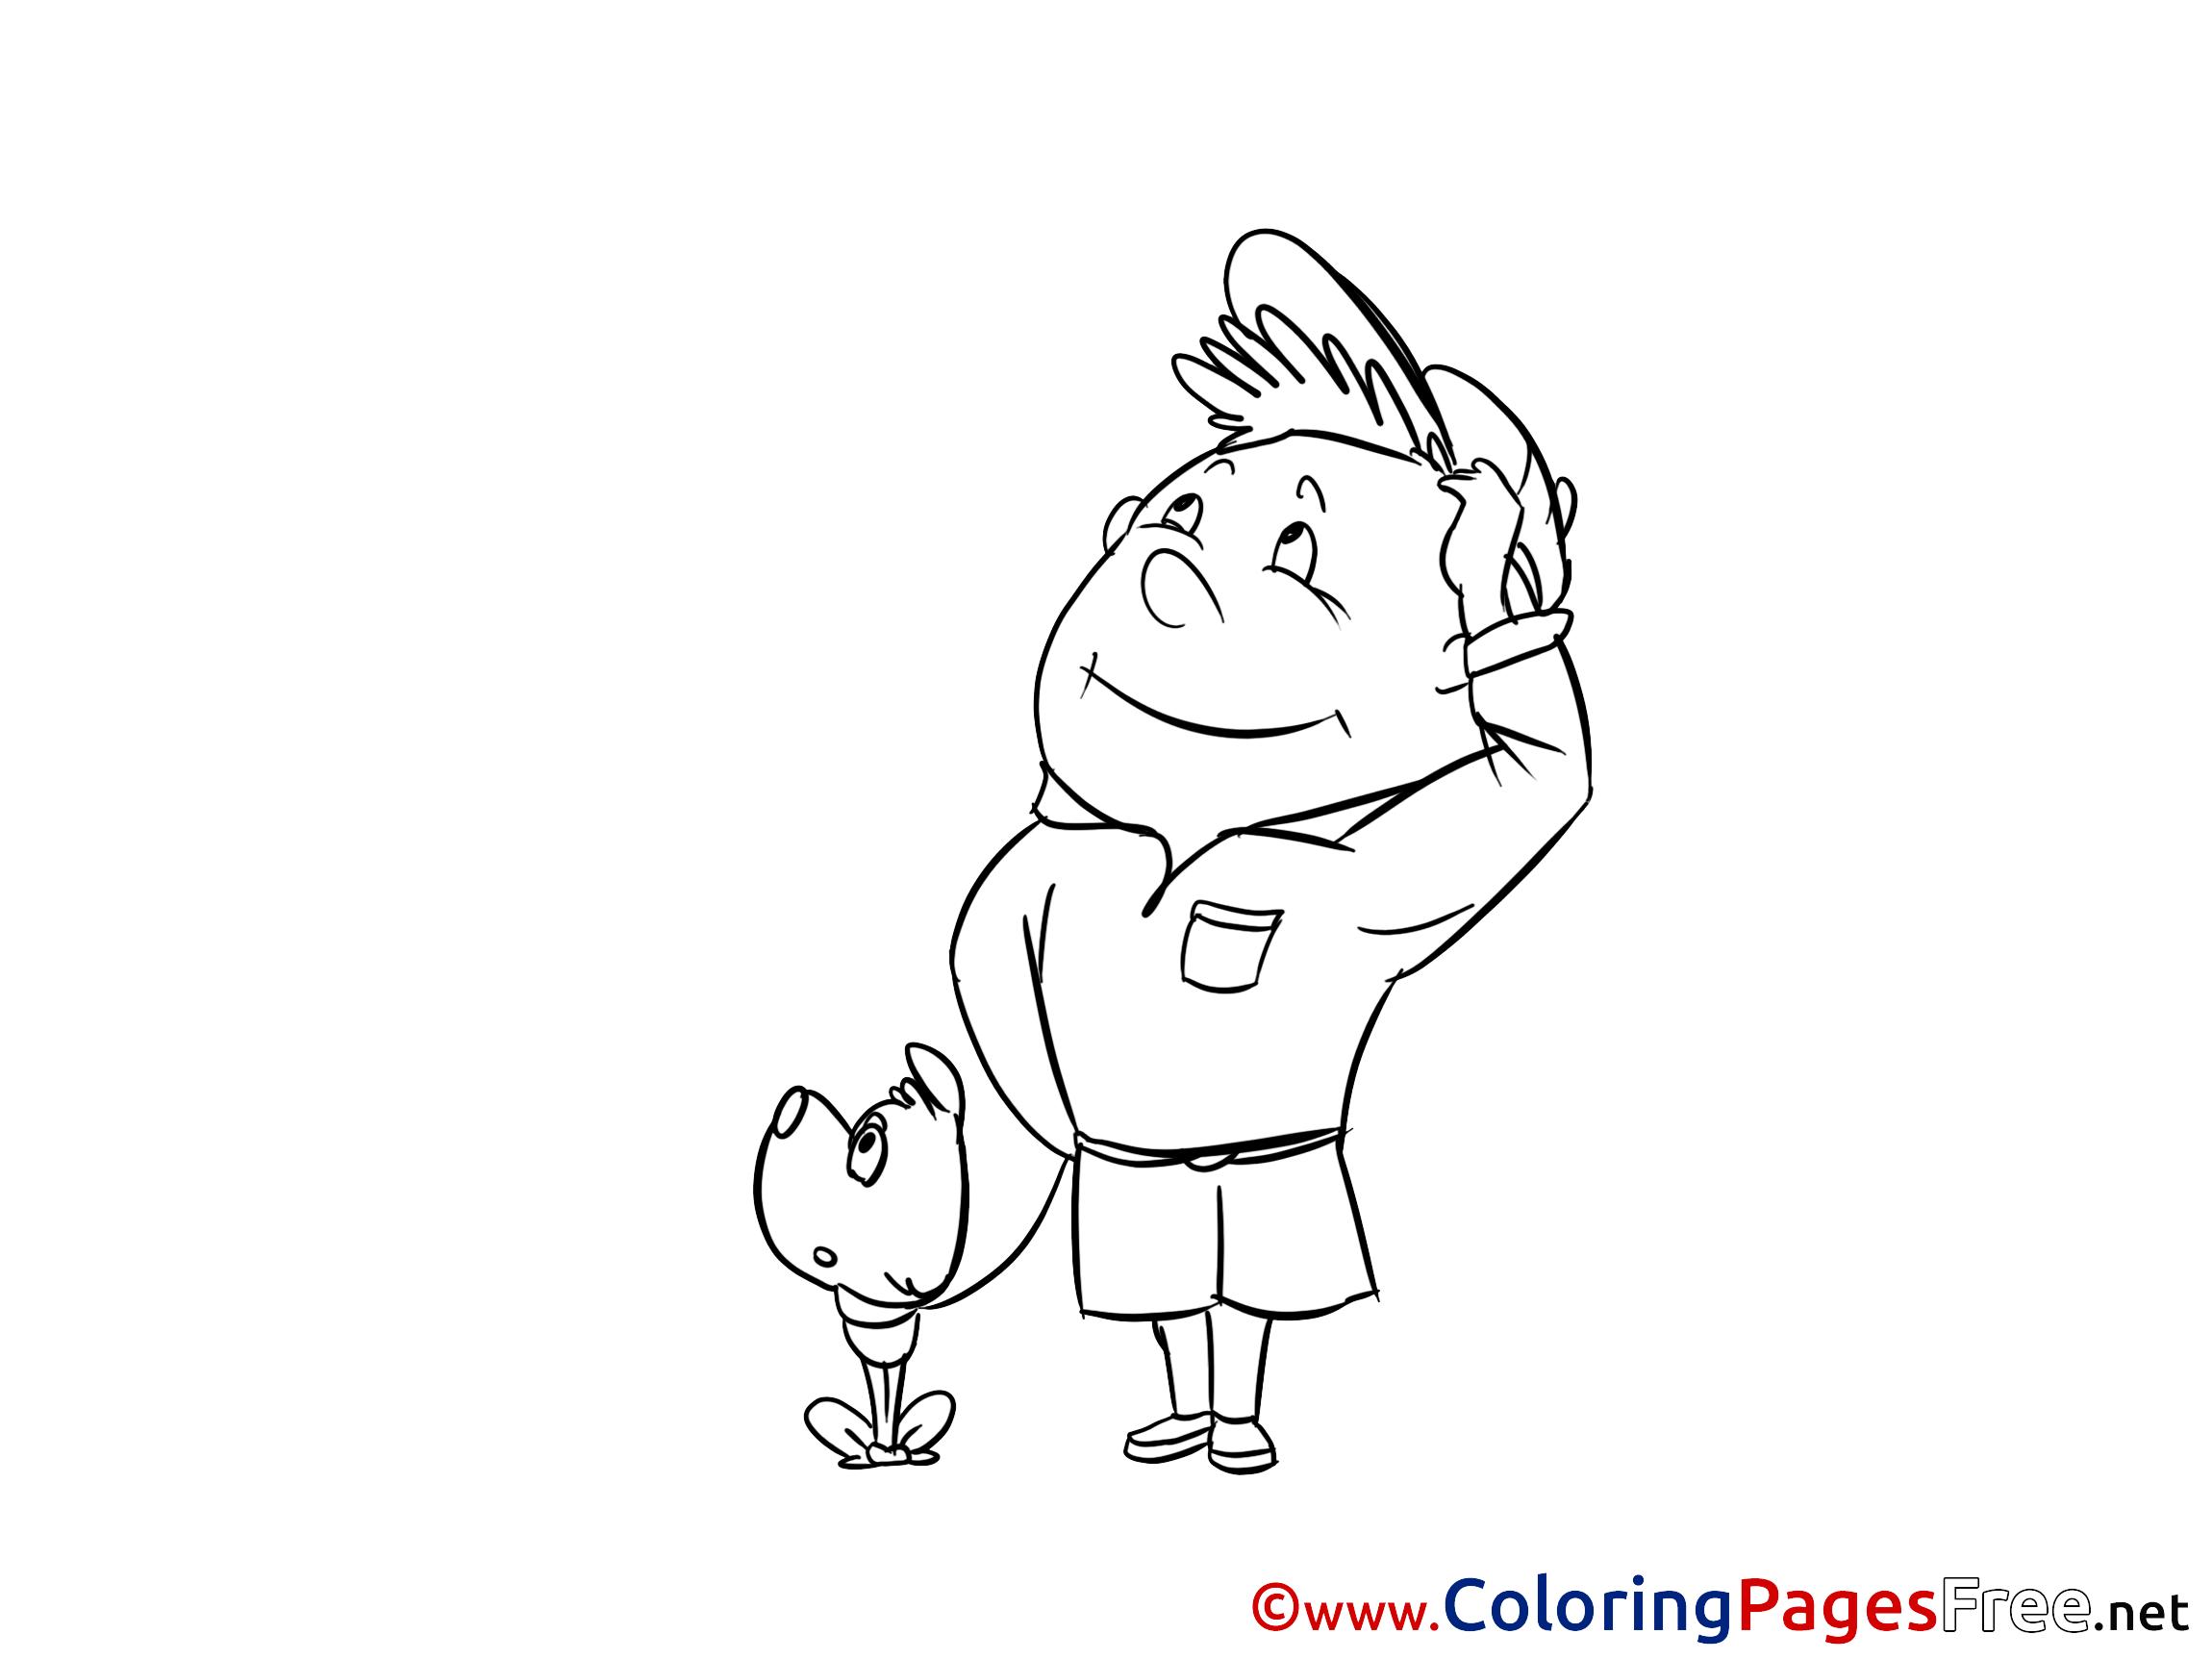 Boy Scout Free Printable Coloring Sheets